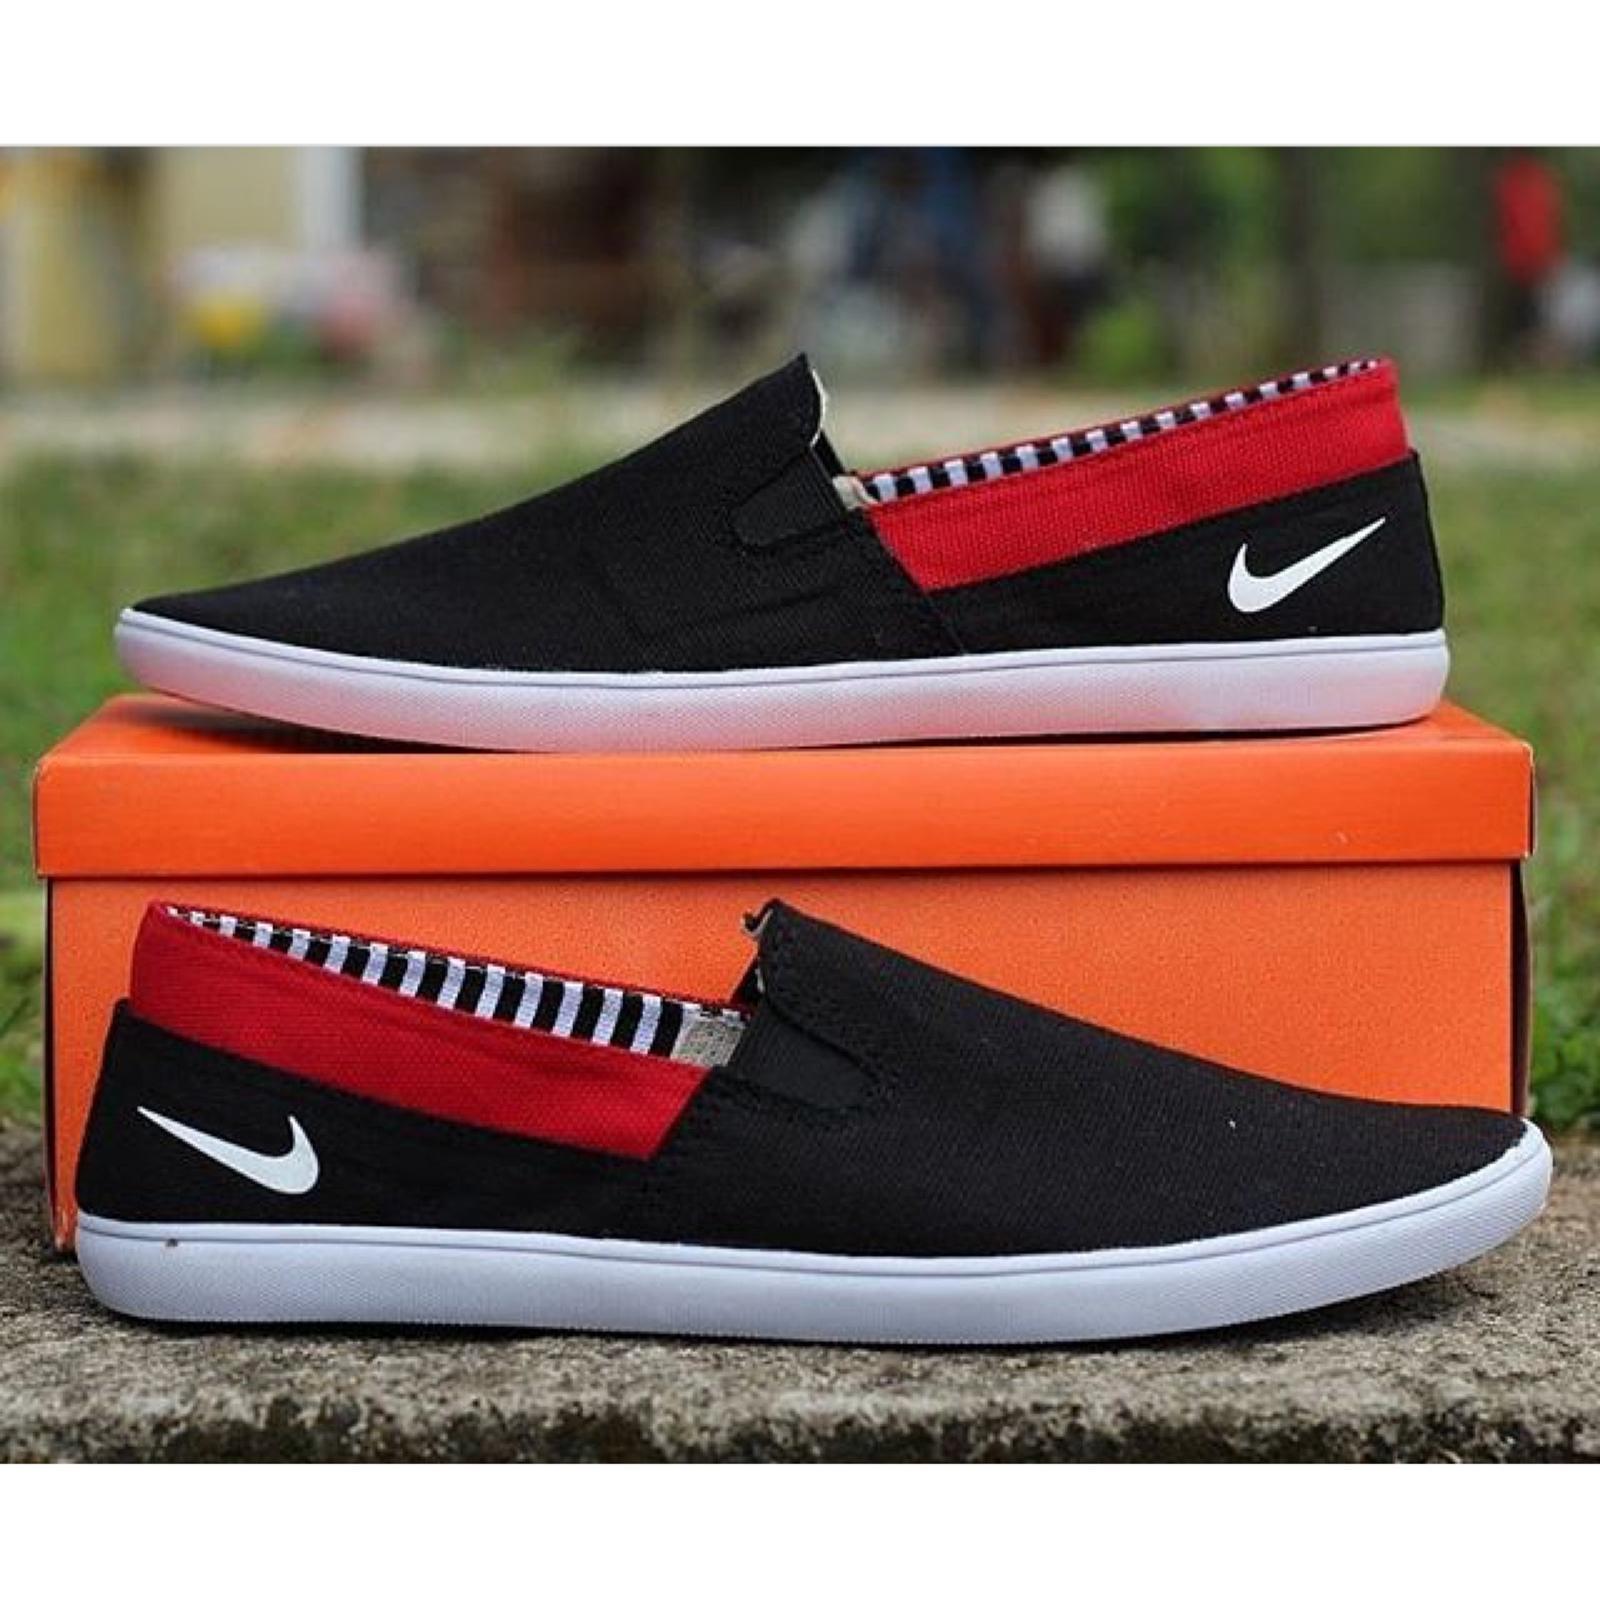 Sepatu Slip On Pria Fashion Lazada Casual Murah - Navy List Merah a4e211eaed